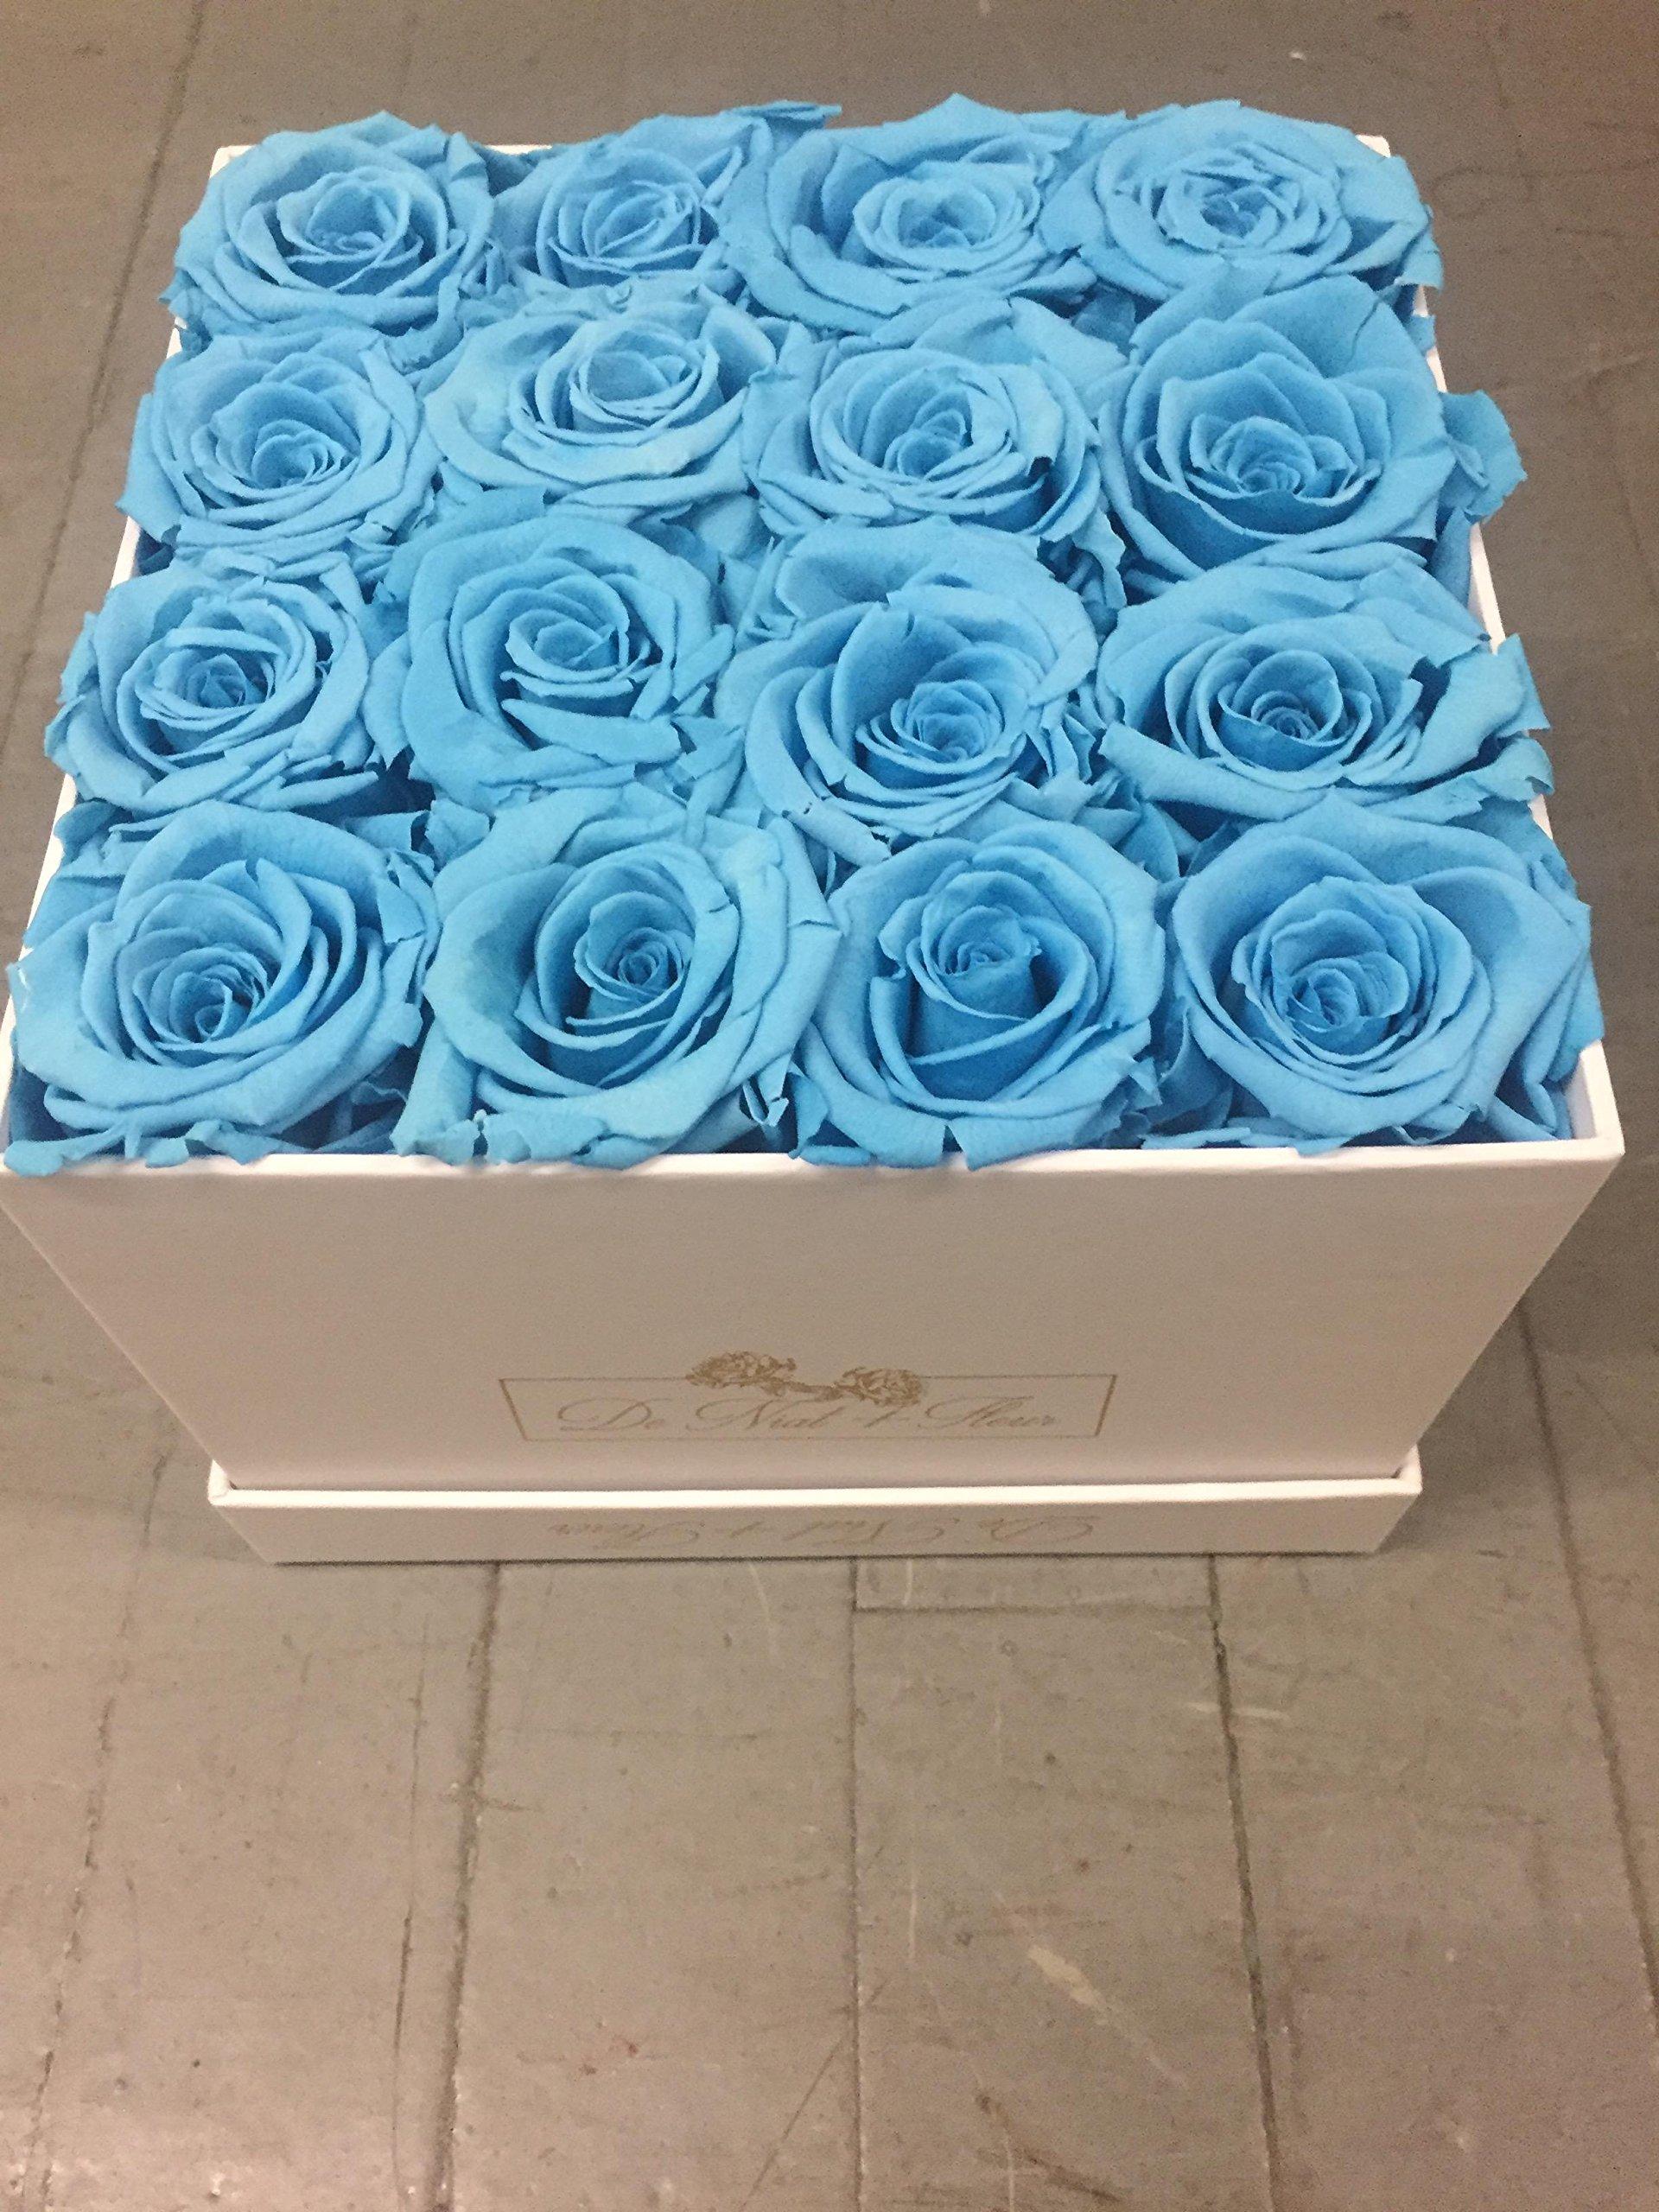 Turquoise Preserved Roses in Elegant White Square Box